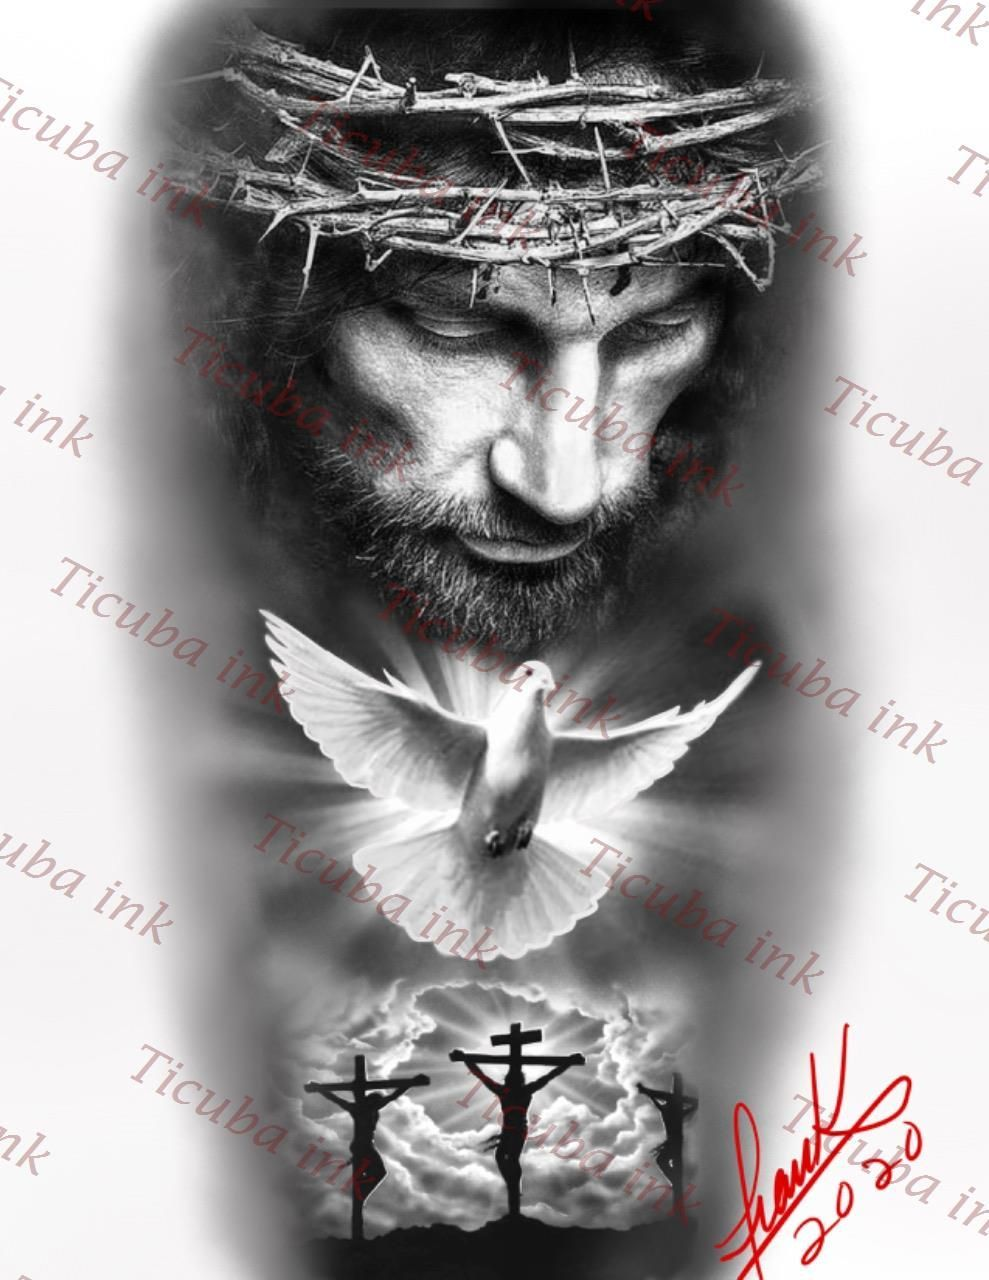 Elegir El Diseño P Not Tatuaje No Siempre Es Lo Máazines Sencillo Huh Cual Debes Considerar M En 2020 Tatuajes De Manga Religiosos Tatuajes Del Cielo Tatuaje De Jesús